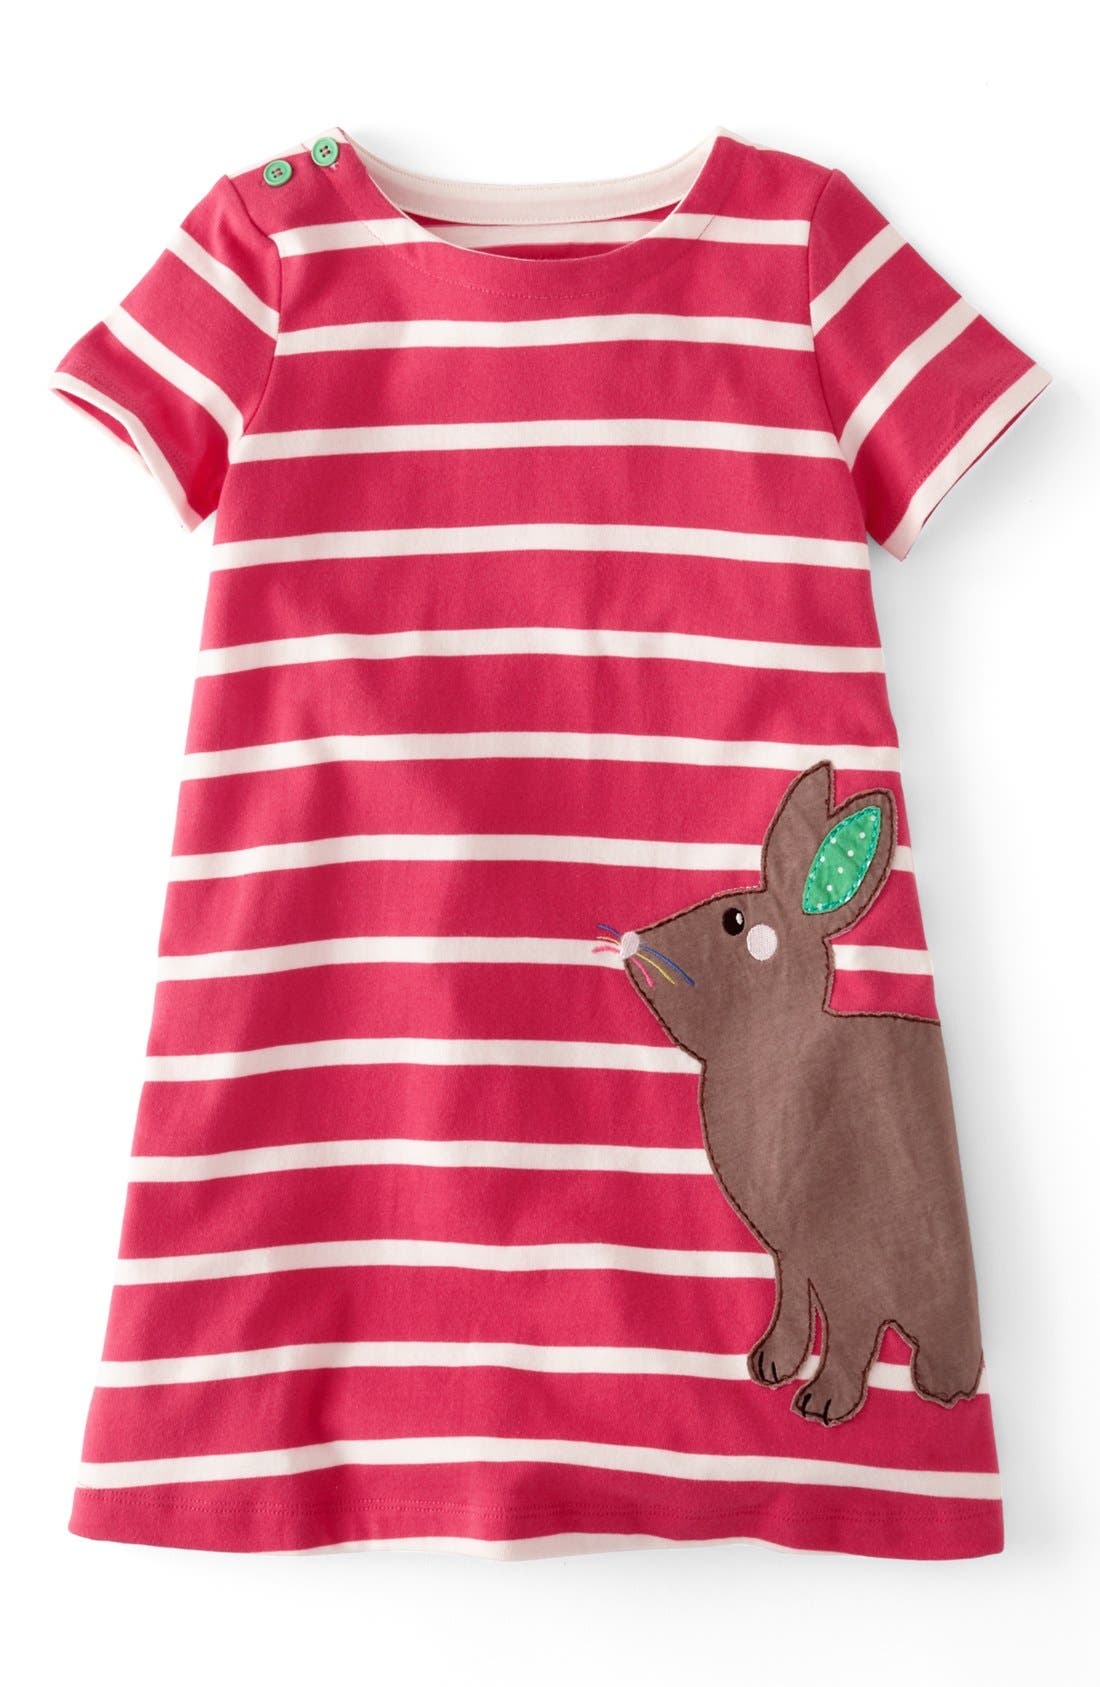 Main Image - Mini Boden Appliqué Dress (Toddler Girls, Little Girls & Big Girls)